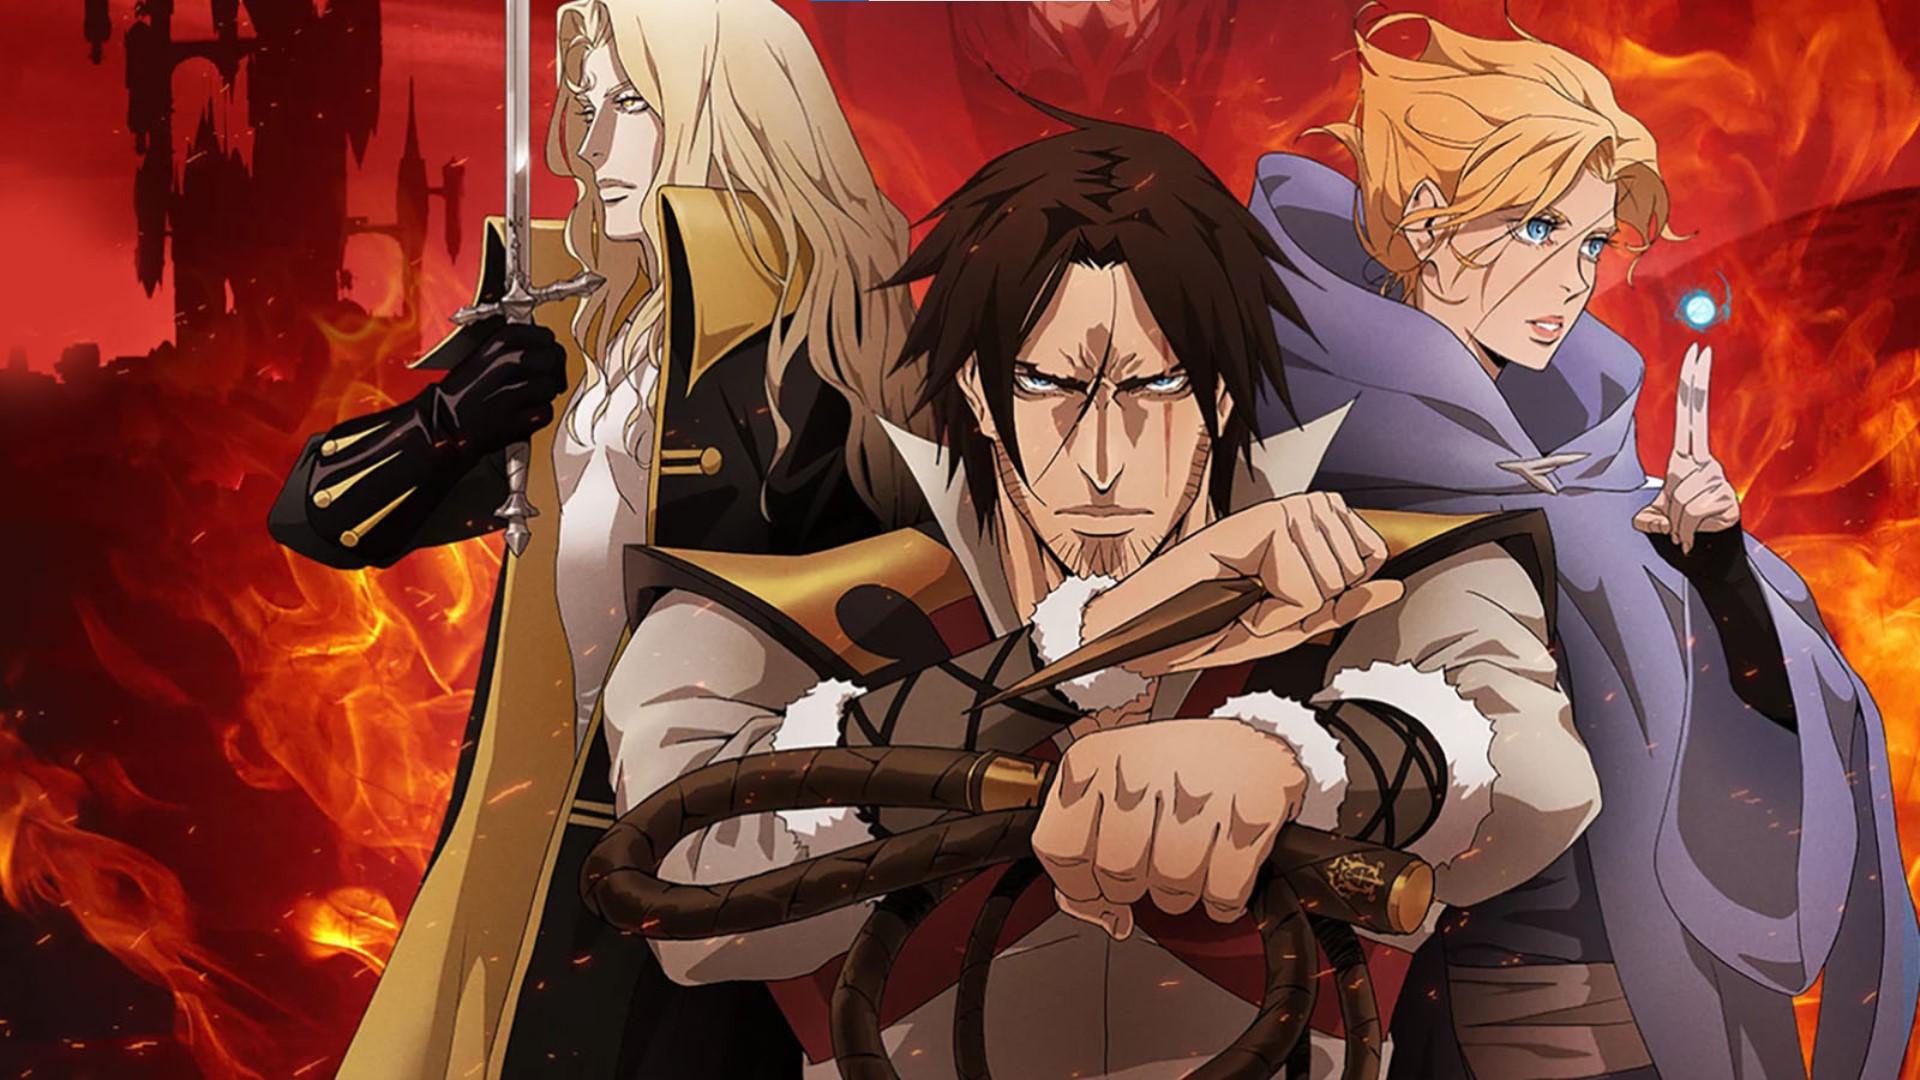 Castlevania- Anime like Noblesse!